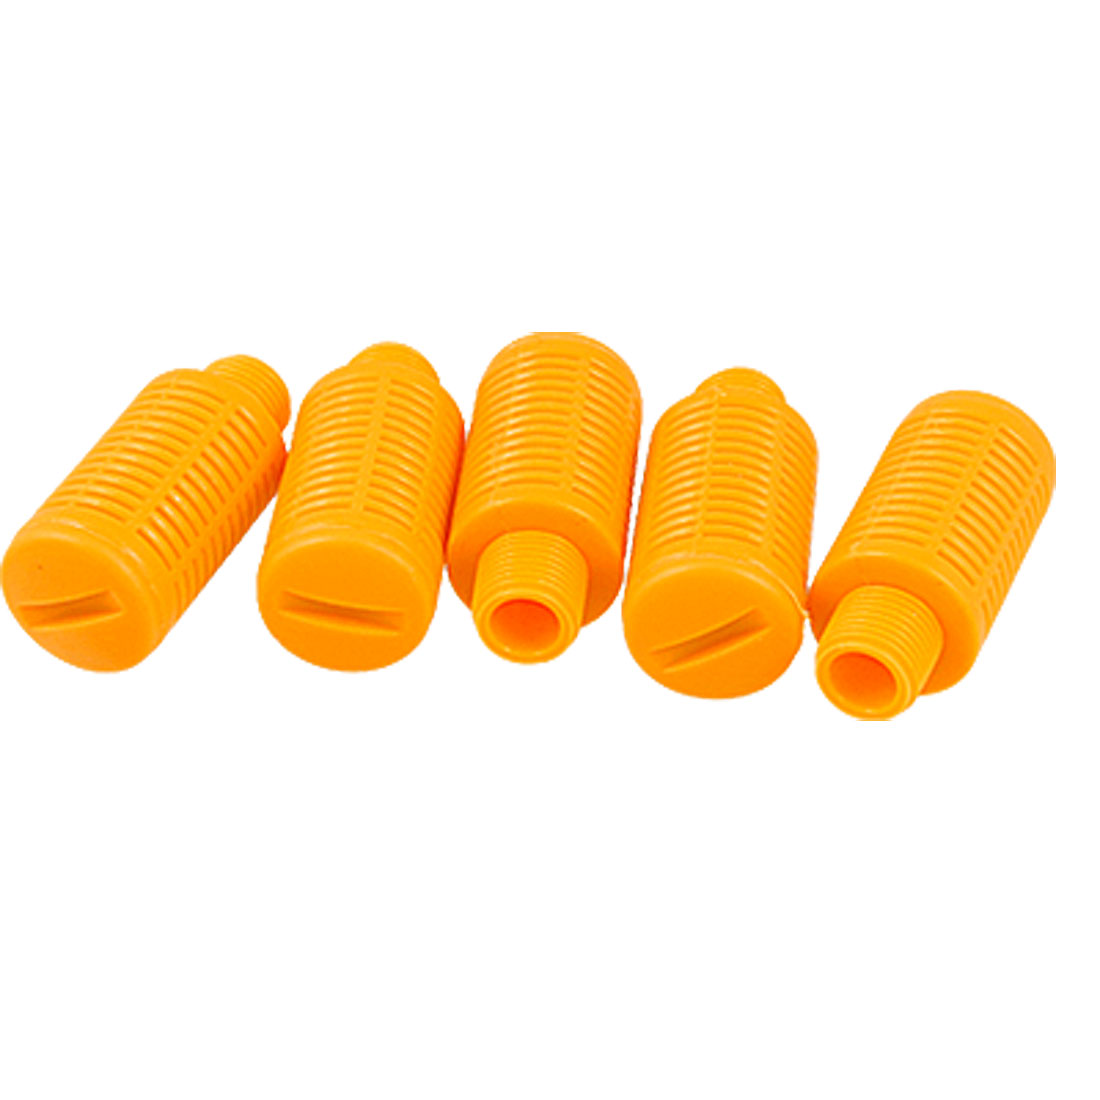 "5 Pcs Orange Plastic 0.35"" Thread Air Exhaust Pneumatic Silencer Muffler"